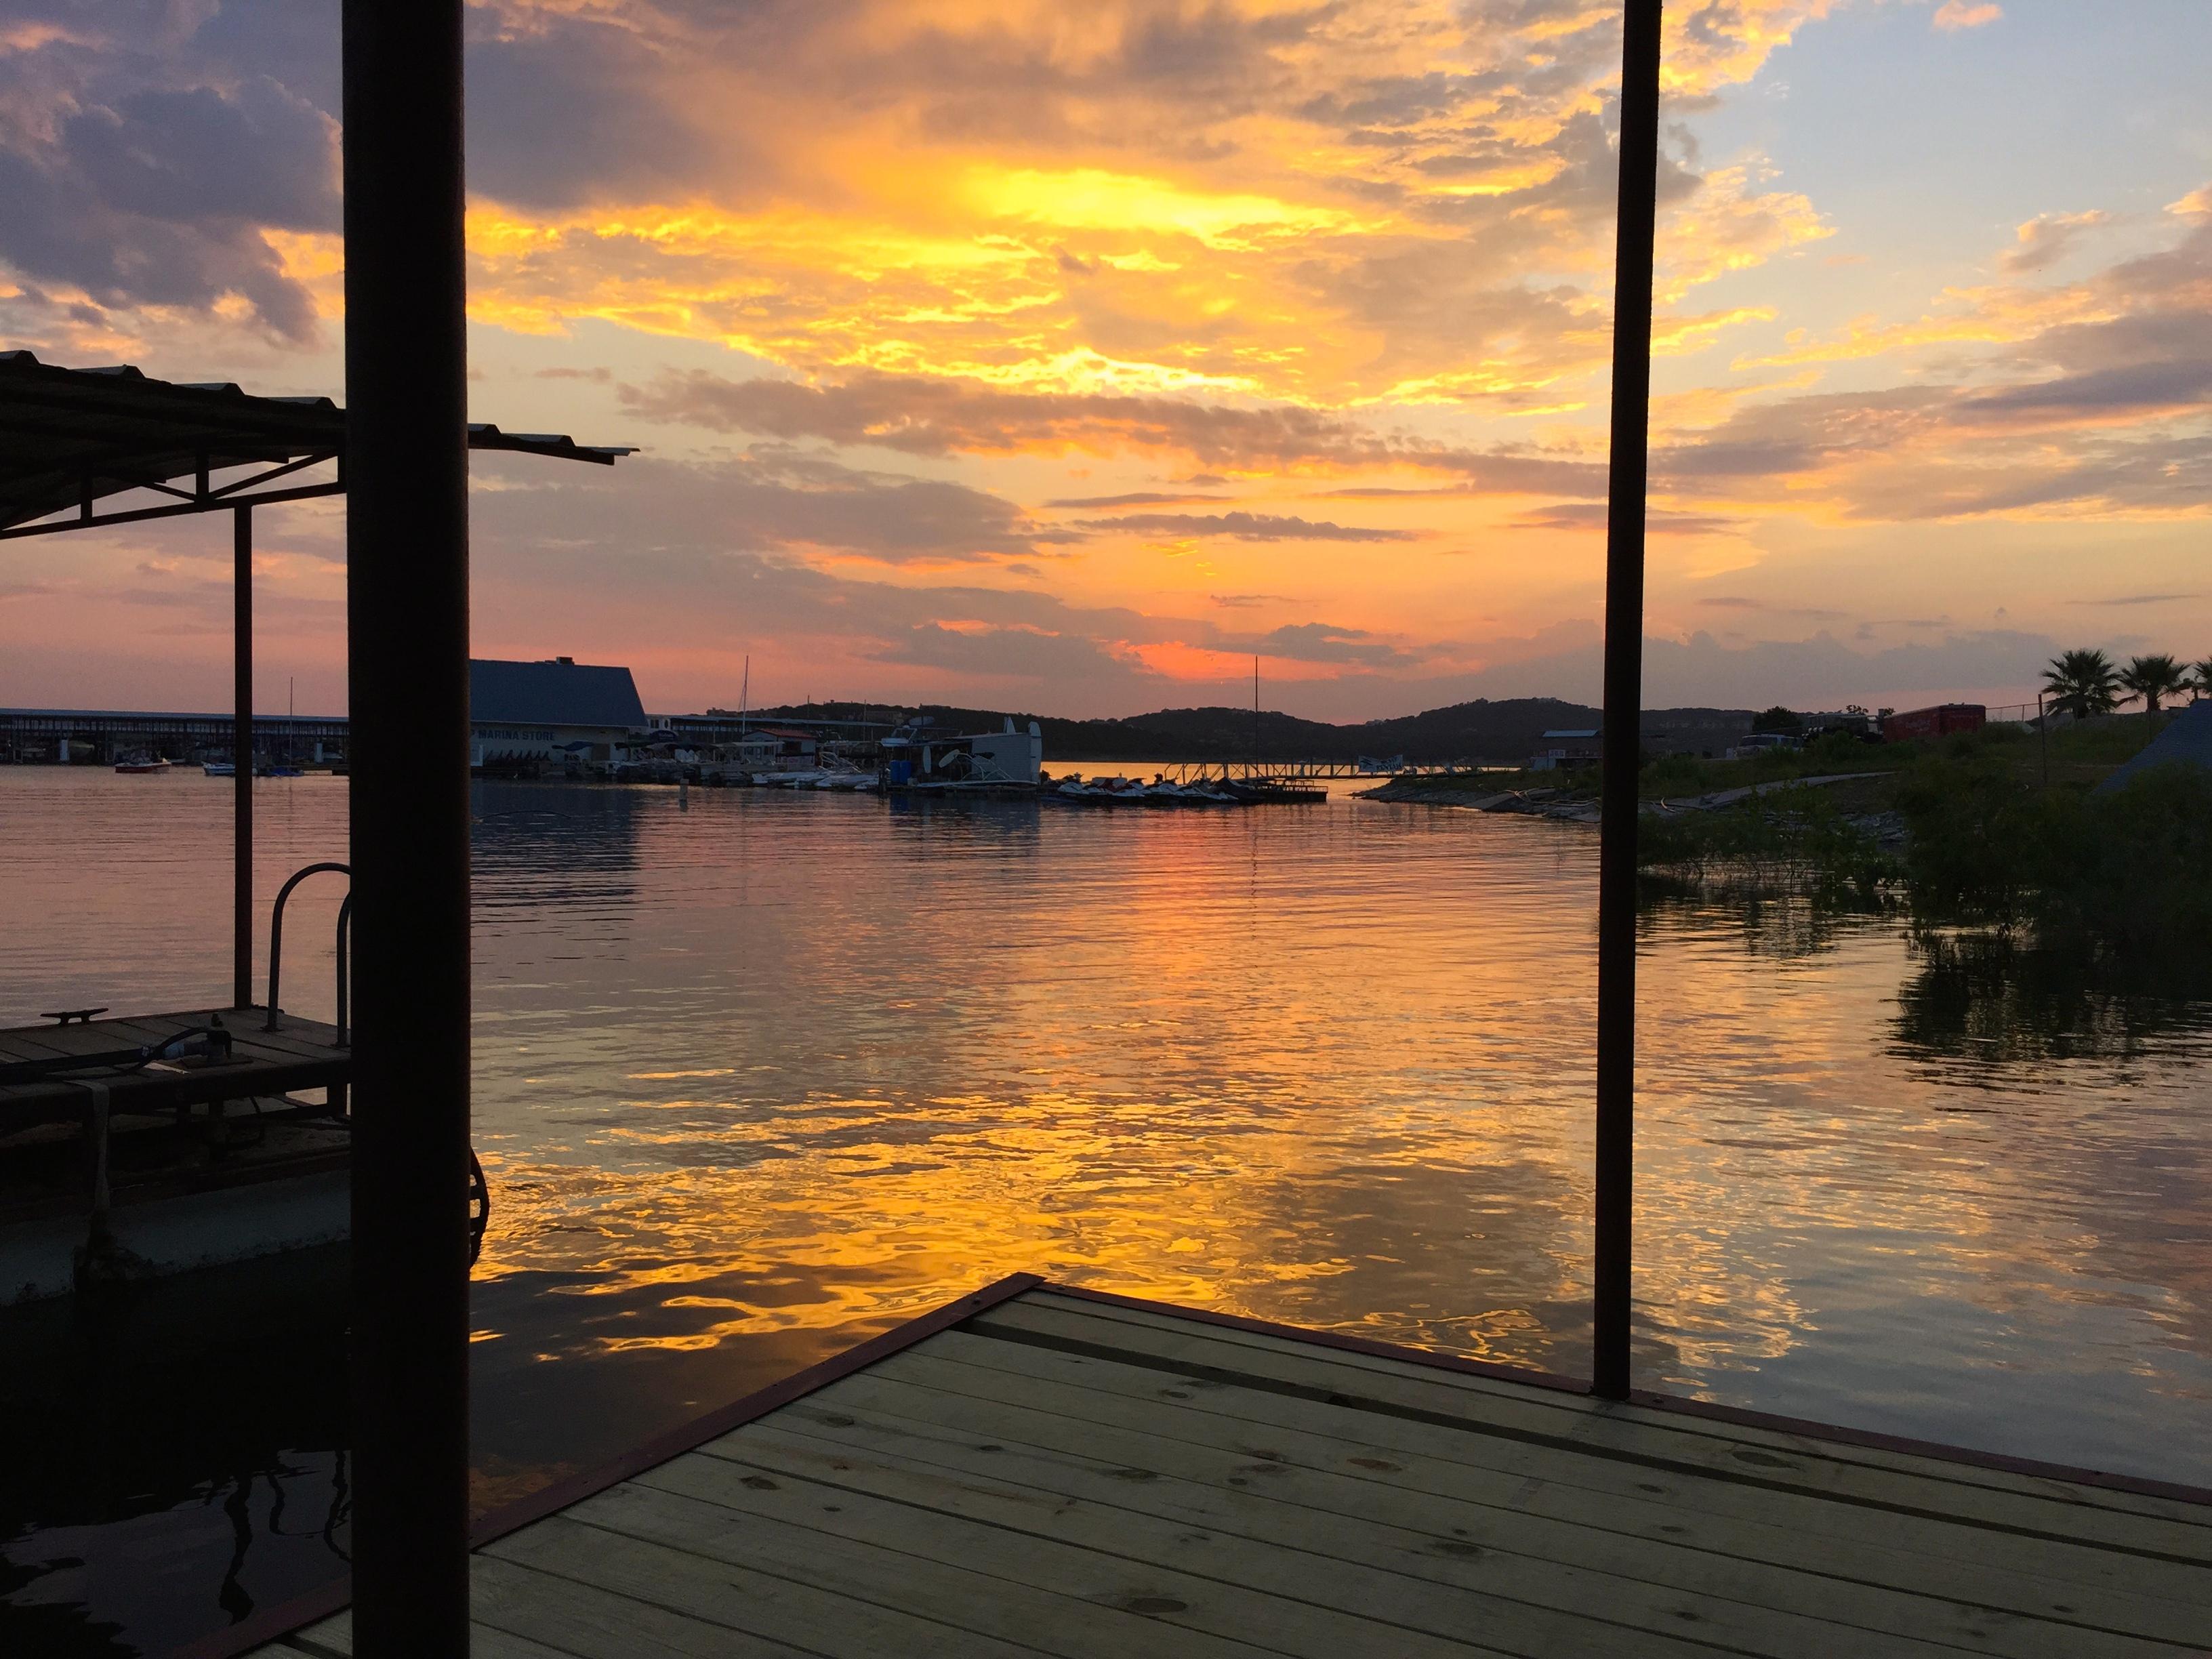 lake travis in your backyard ra88766 redawning